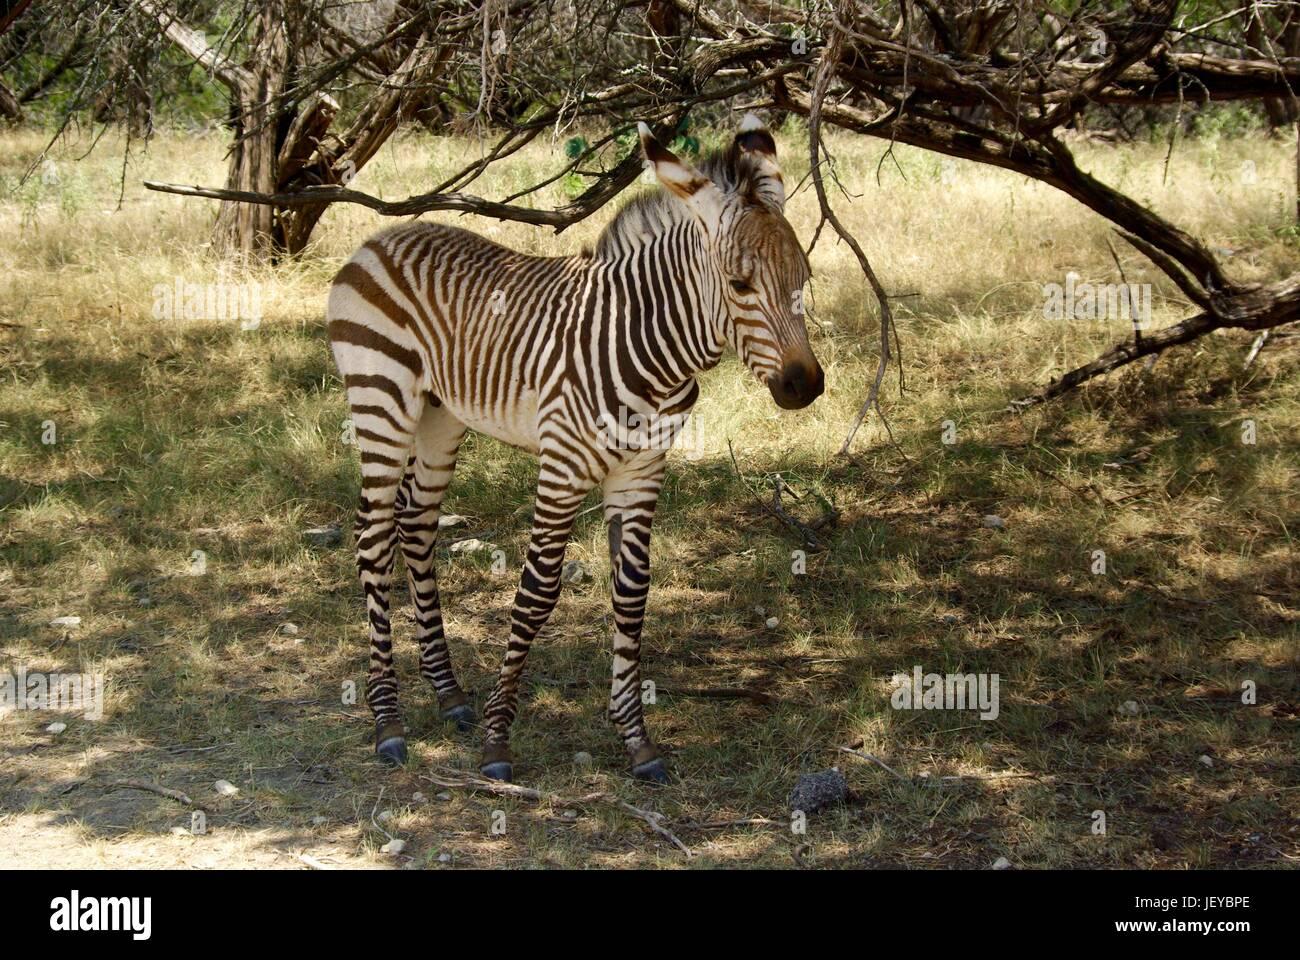 Baby Zebra - Stock Image